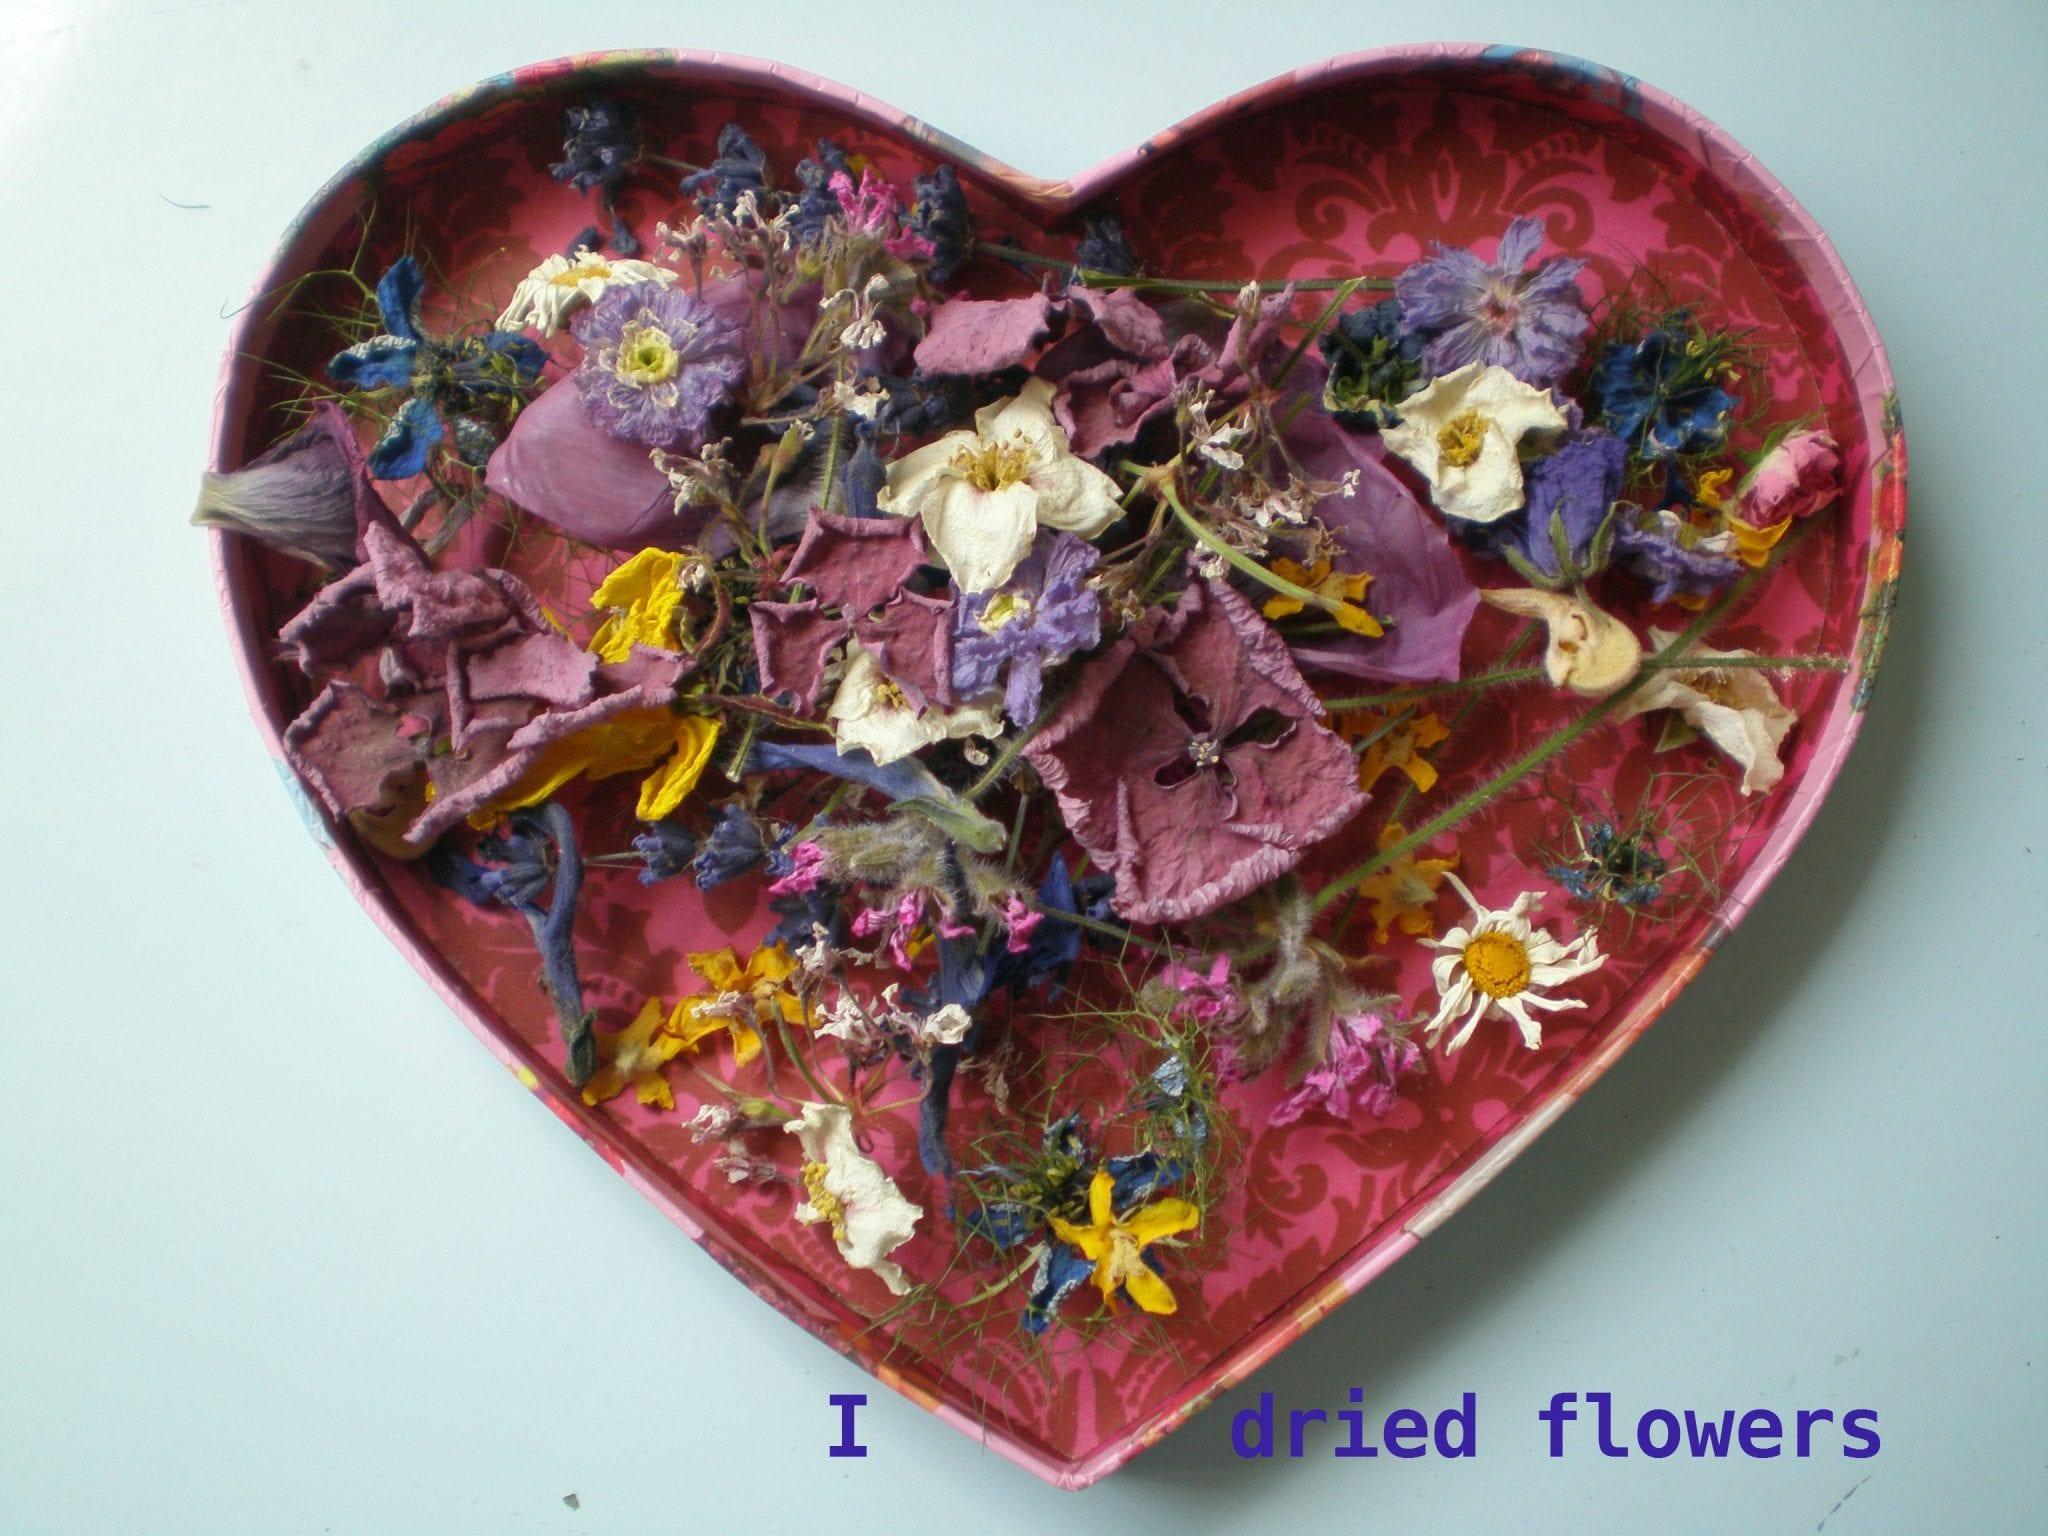 I love dried flowers